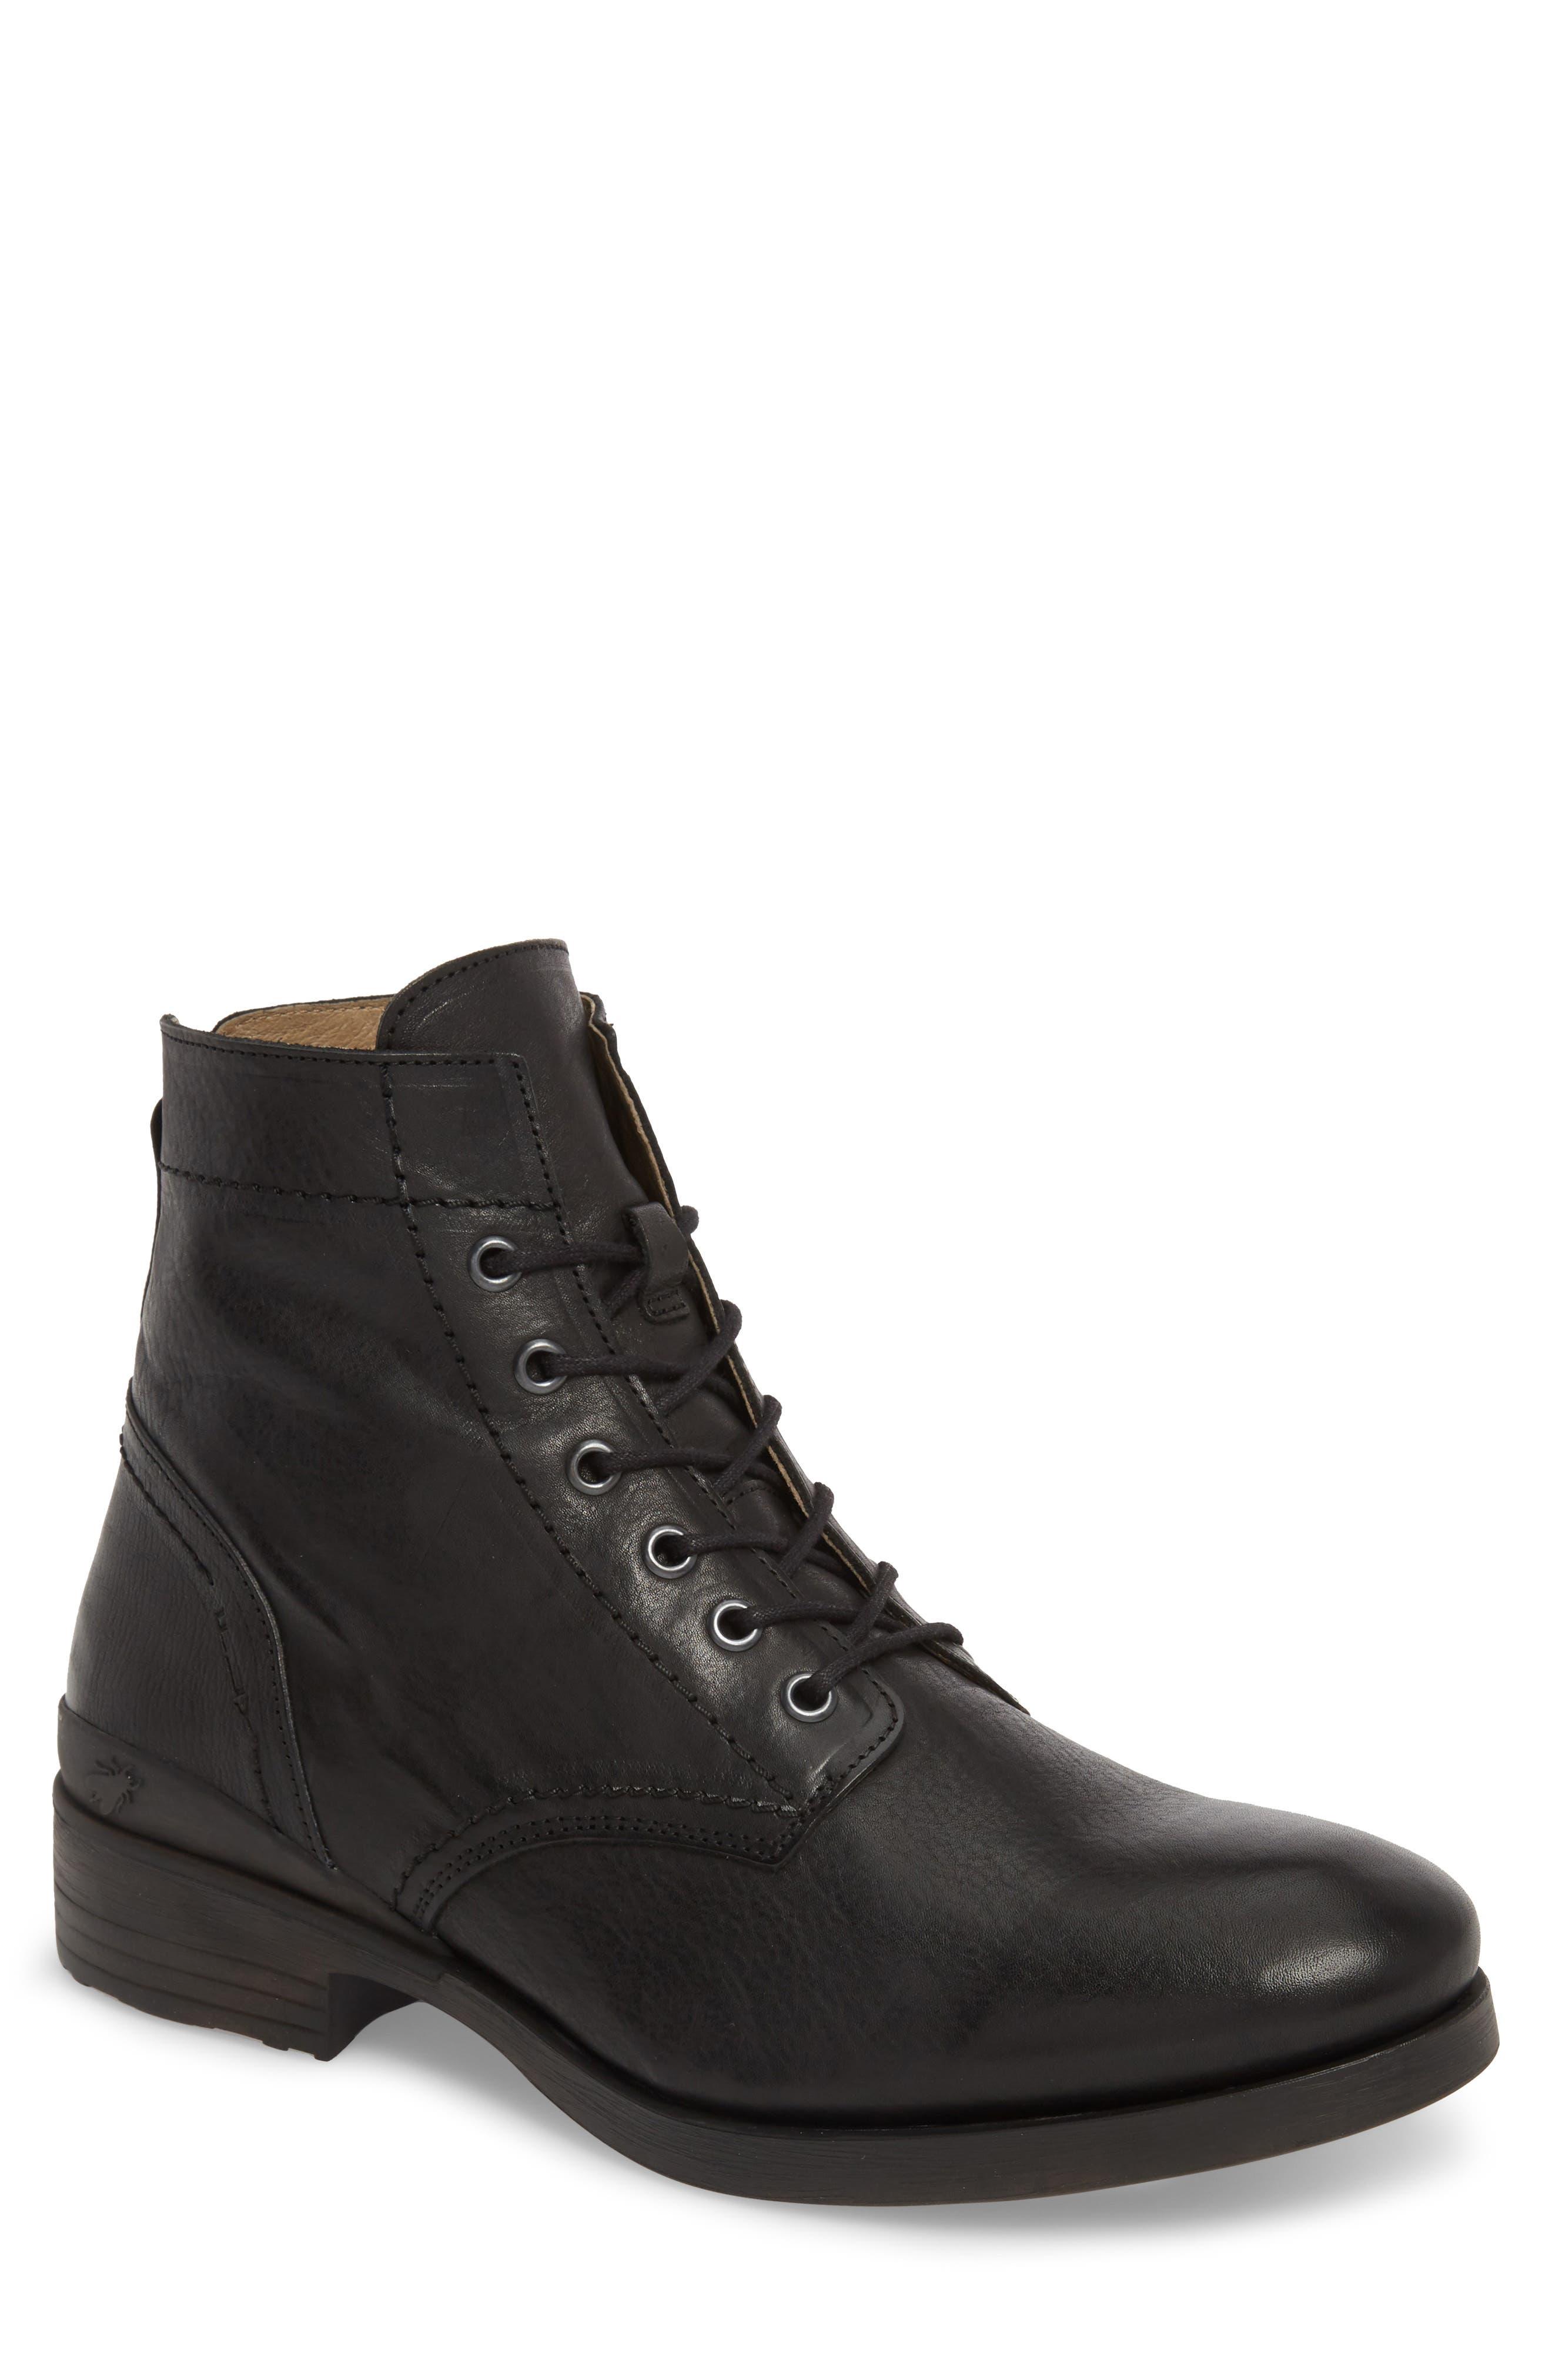 Marc Combat Boot,                         Main,                         color, BLACK APSO